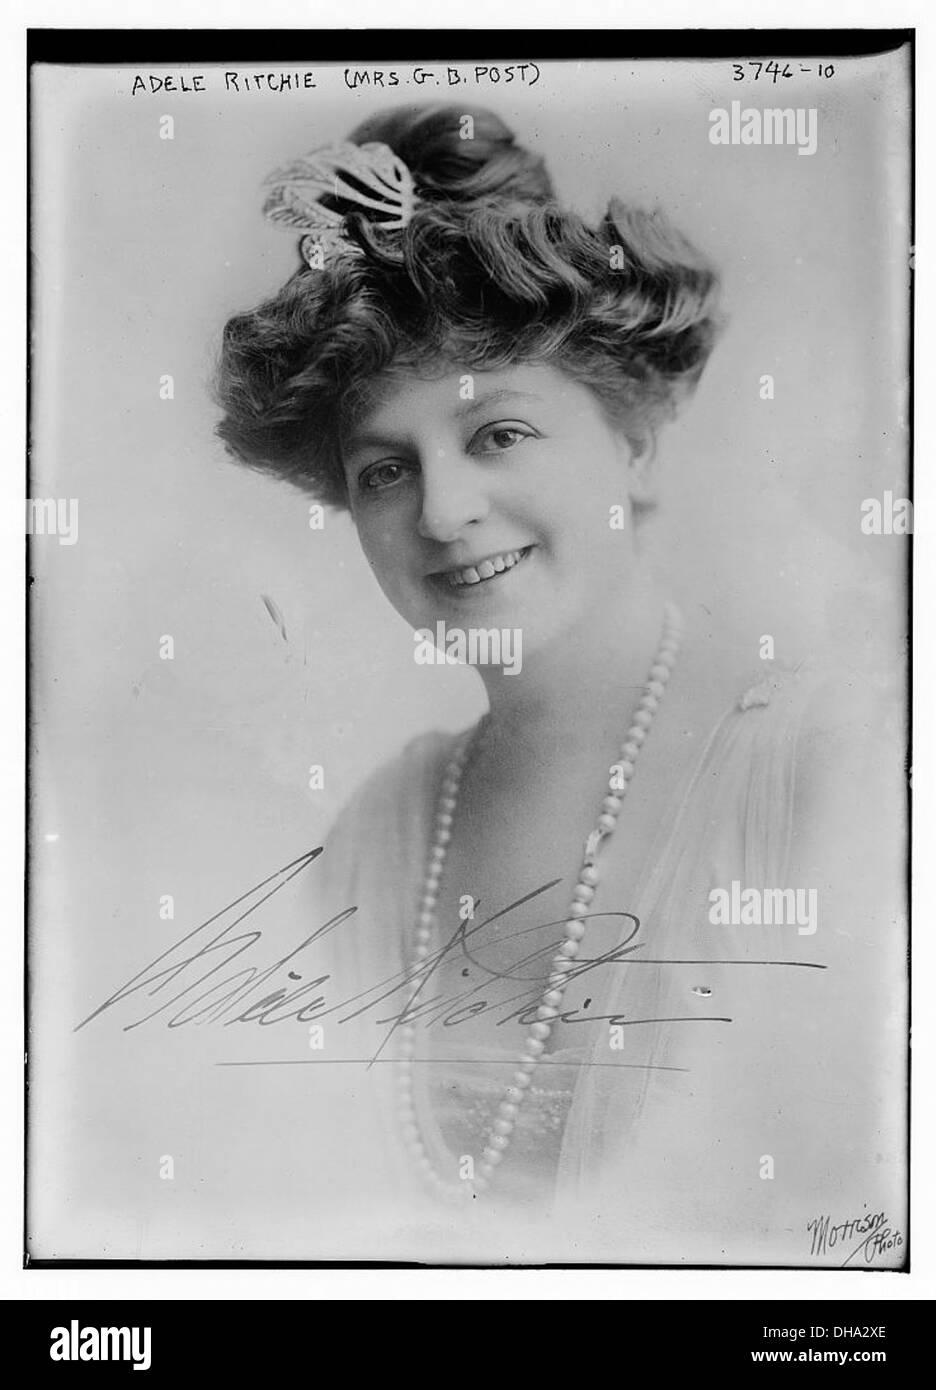 Adele Ritchie (Mrs. G.B. Post) (LOC) - Stock Image